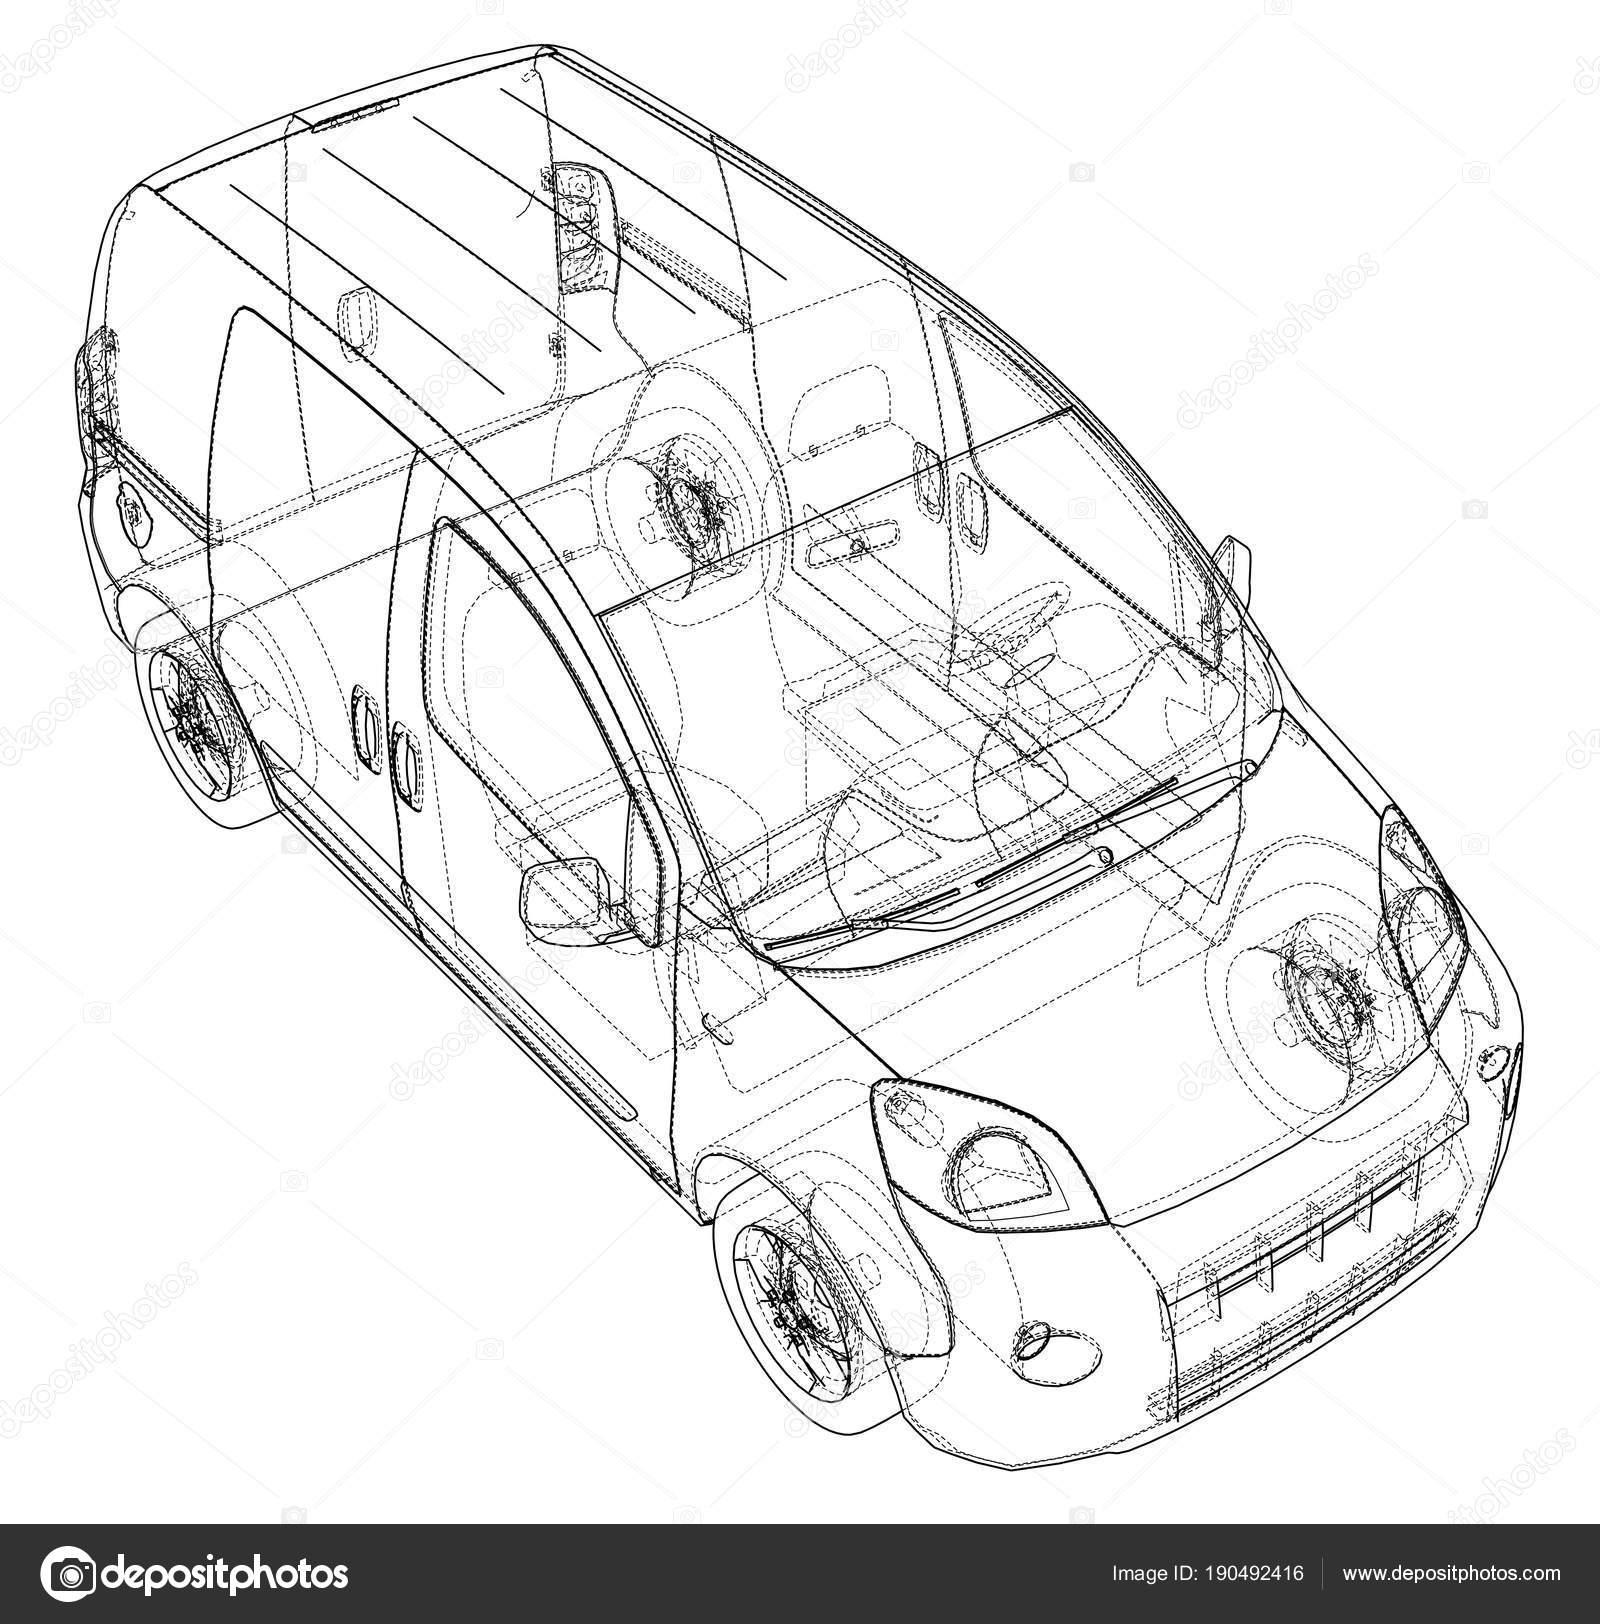 Concept car blueprint — Stock Photo © cherezoff #190492416